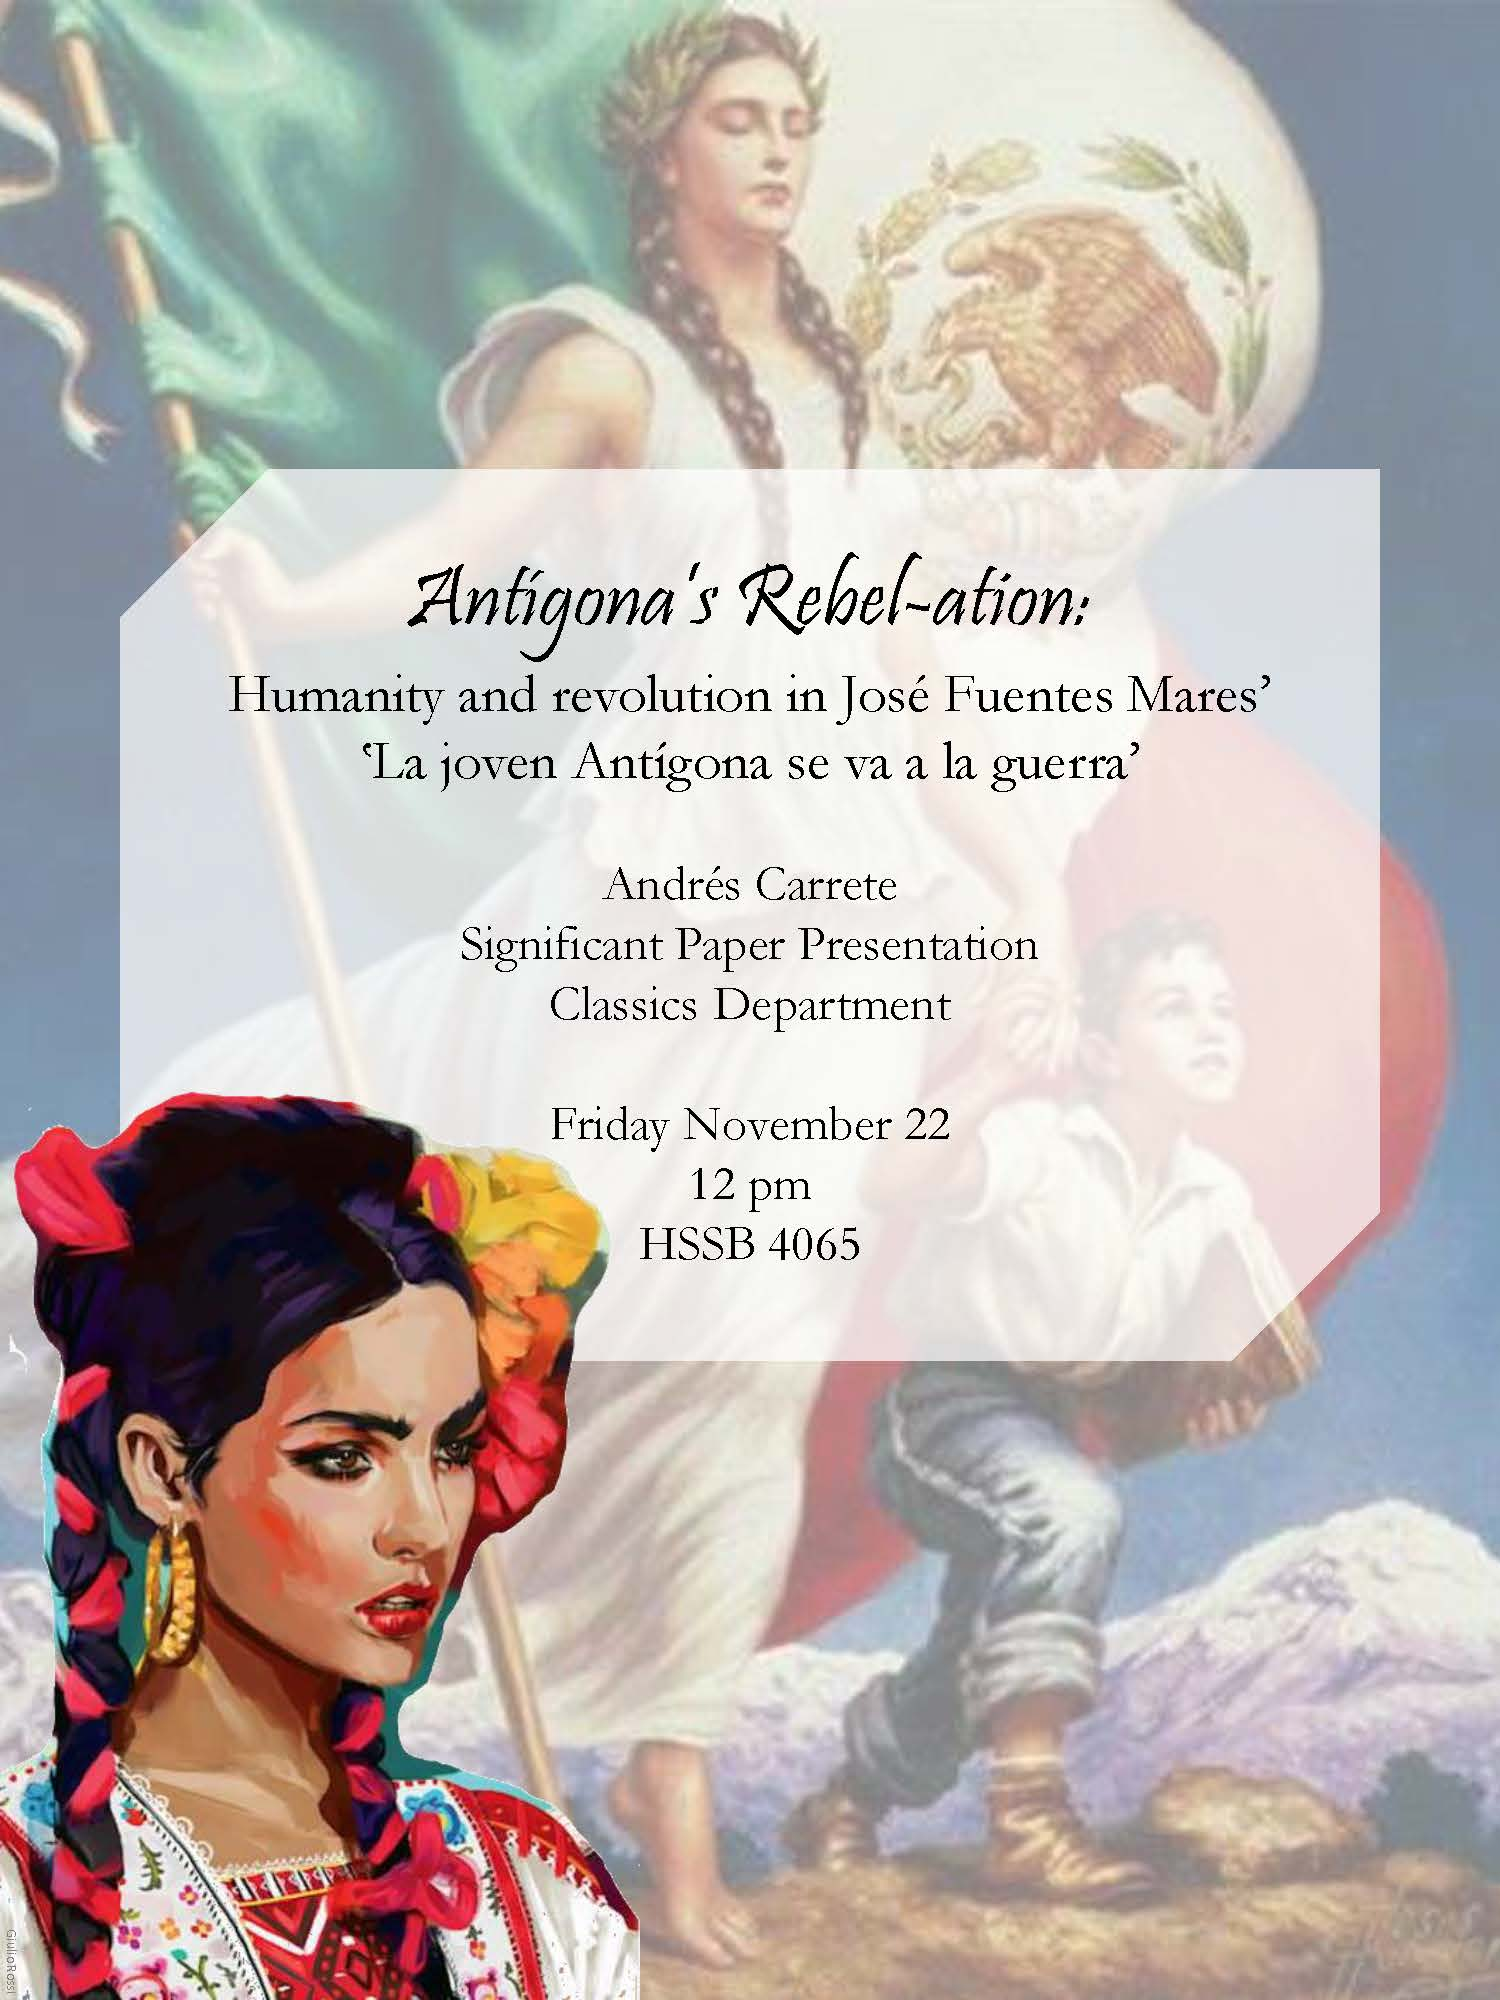 "Andrés Carrete Special Paper Presentation, ""Antígona's Rebel-ation: Humanity and revolution in José Fuentes Mares' 'La joven Antígona se va a la guerra'"""